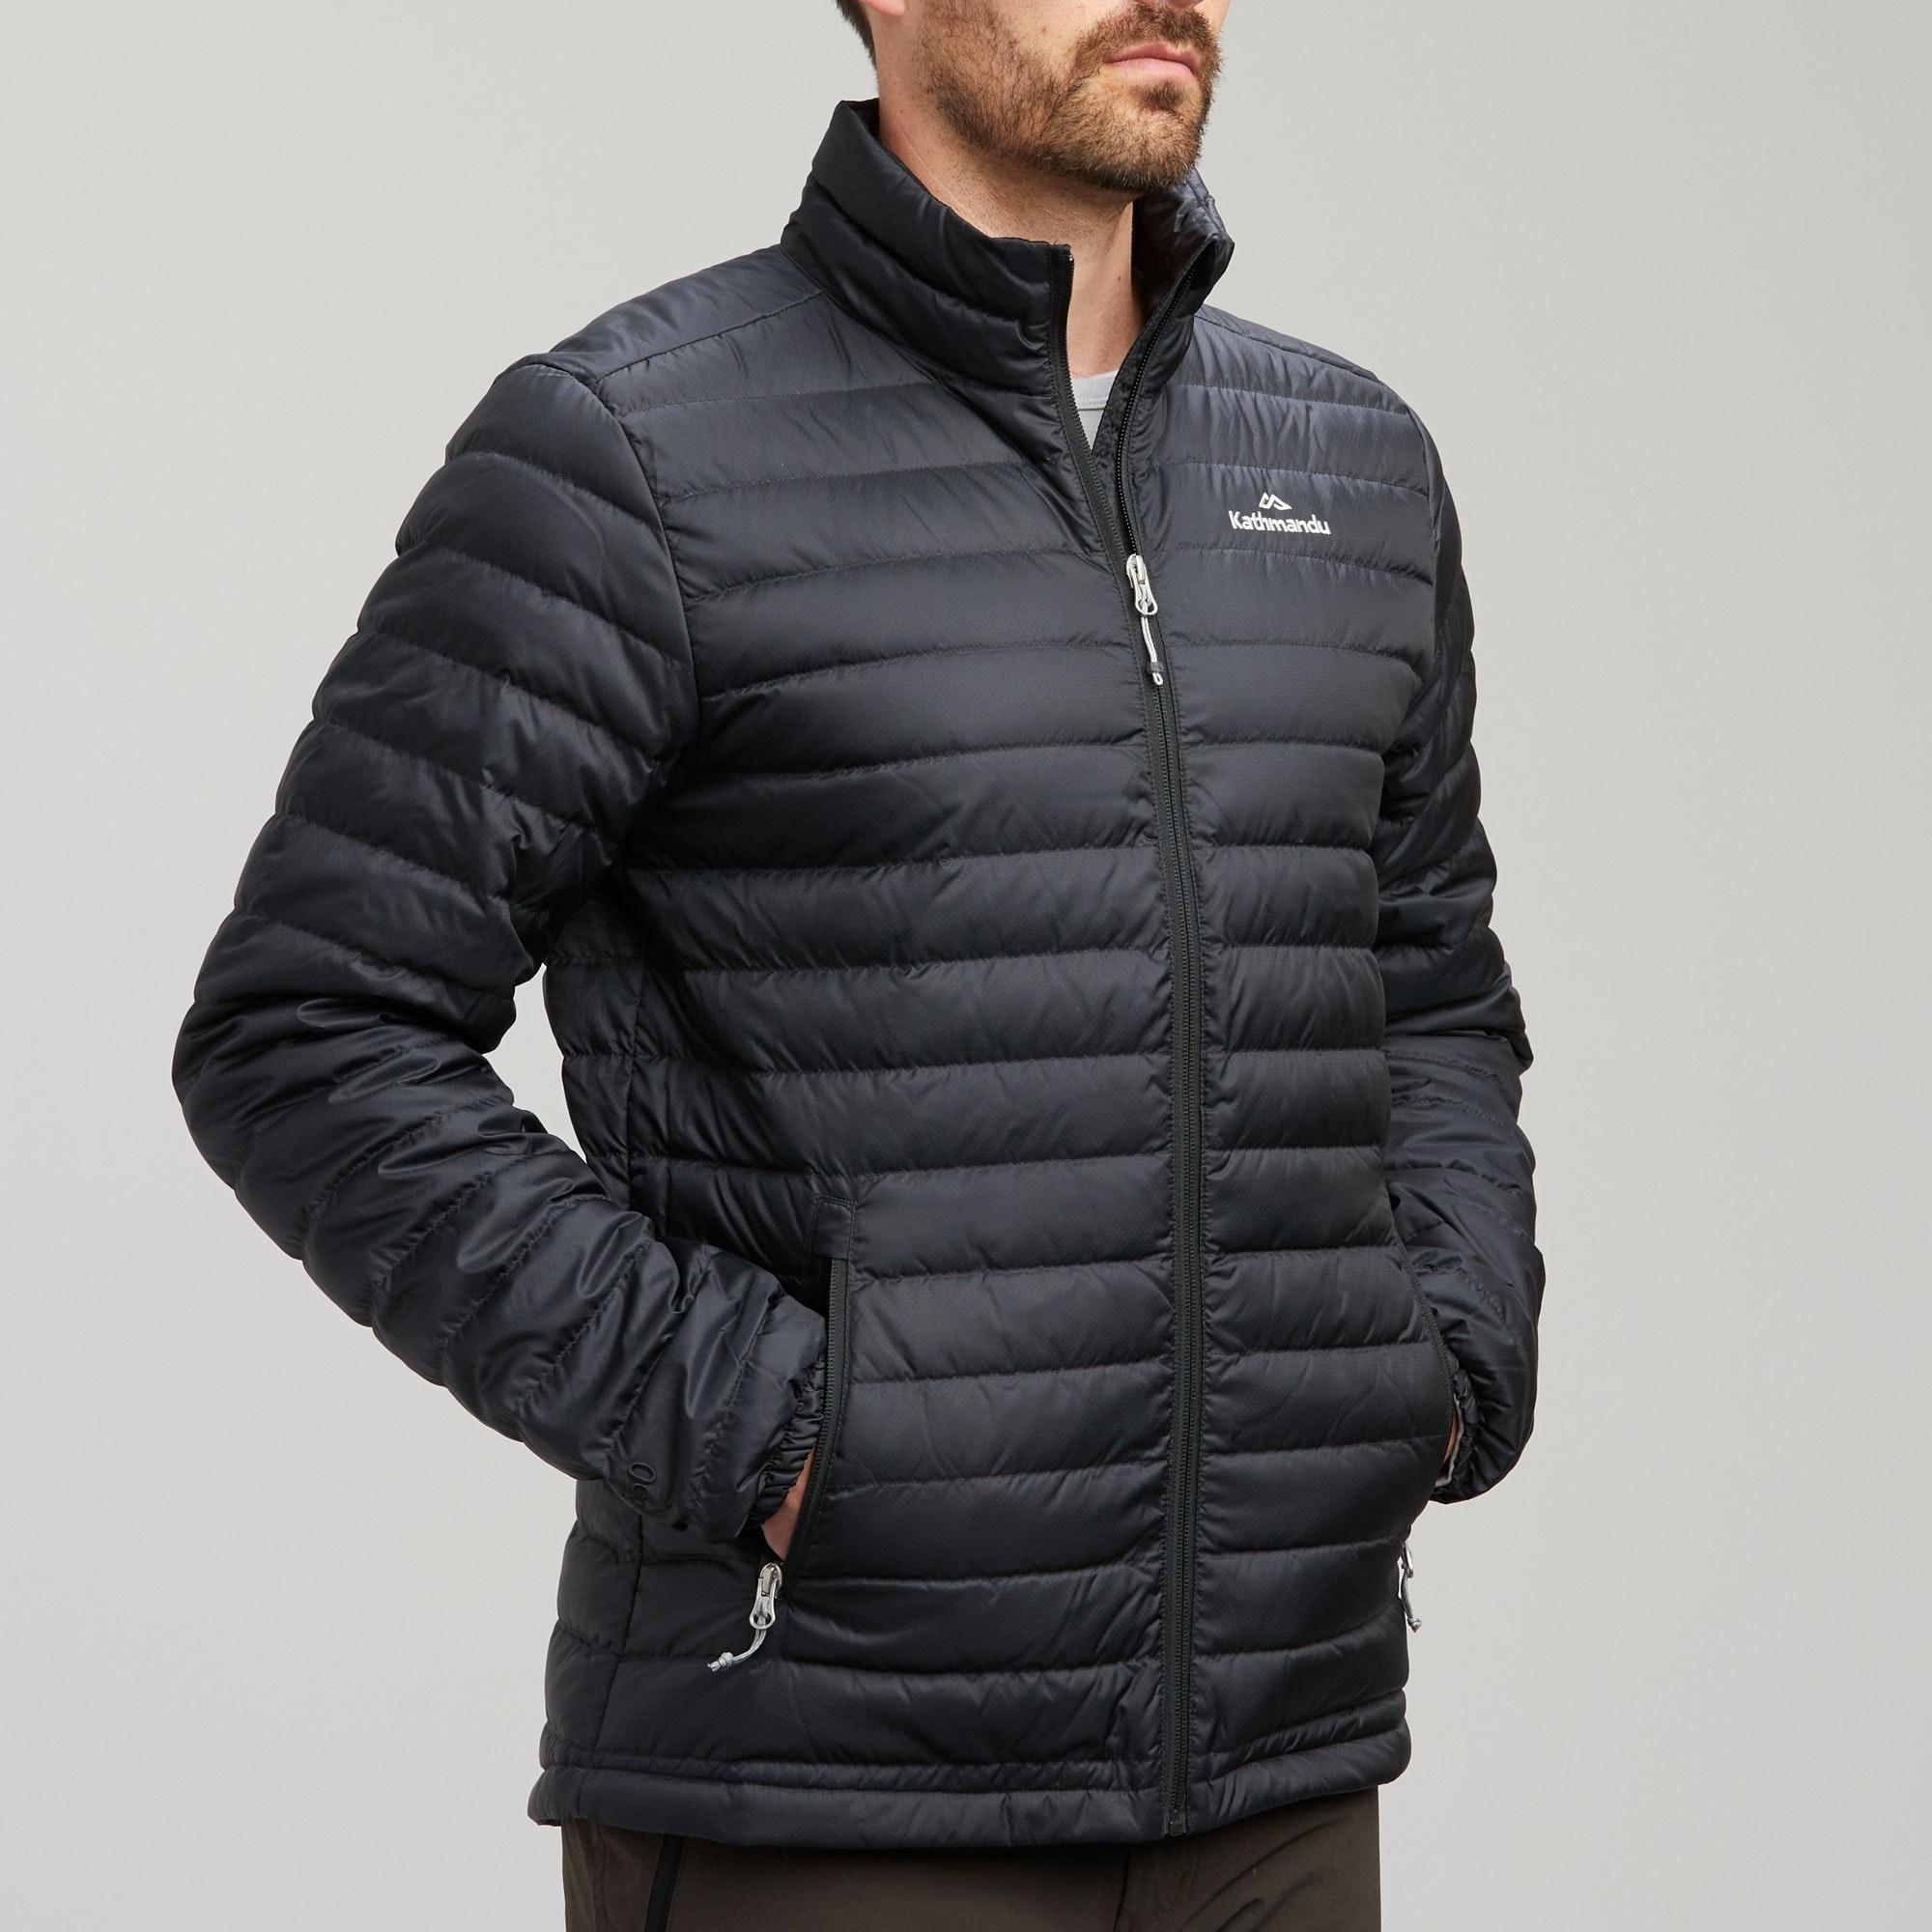 NEW-Kathmandu-Heli-Men-039-s-Lightweight-Duck-Down-Coat-Warm-Puffer-Jacket-v2 thumbnail 12